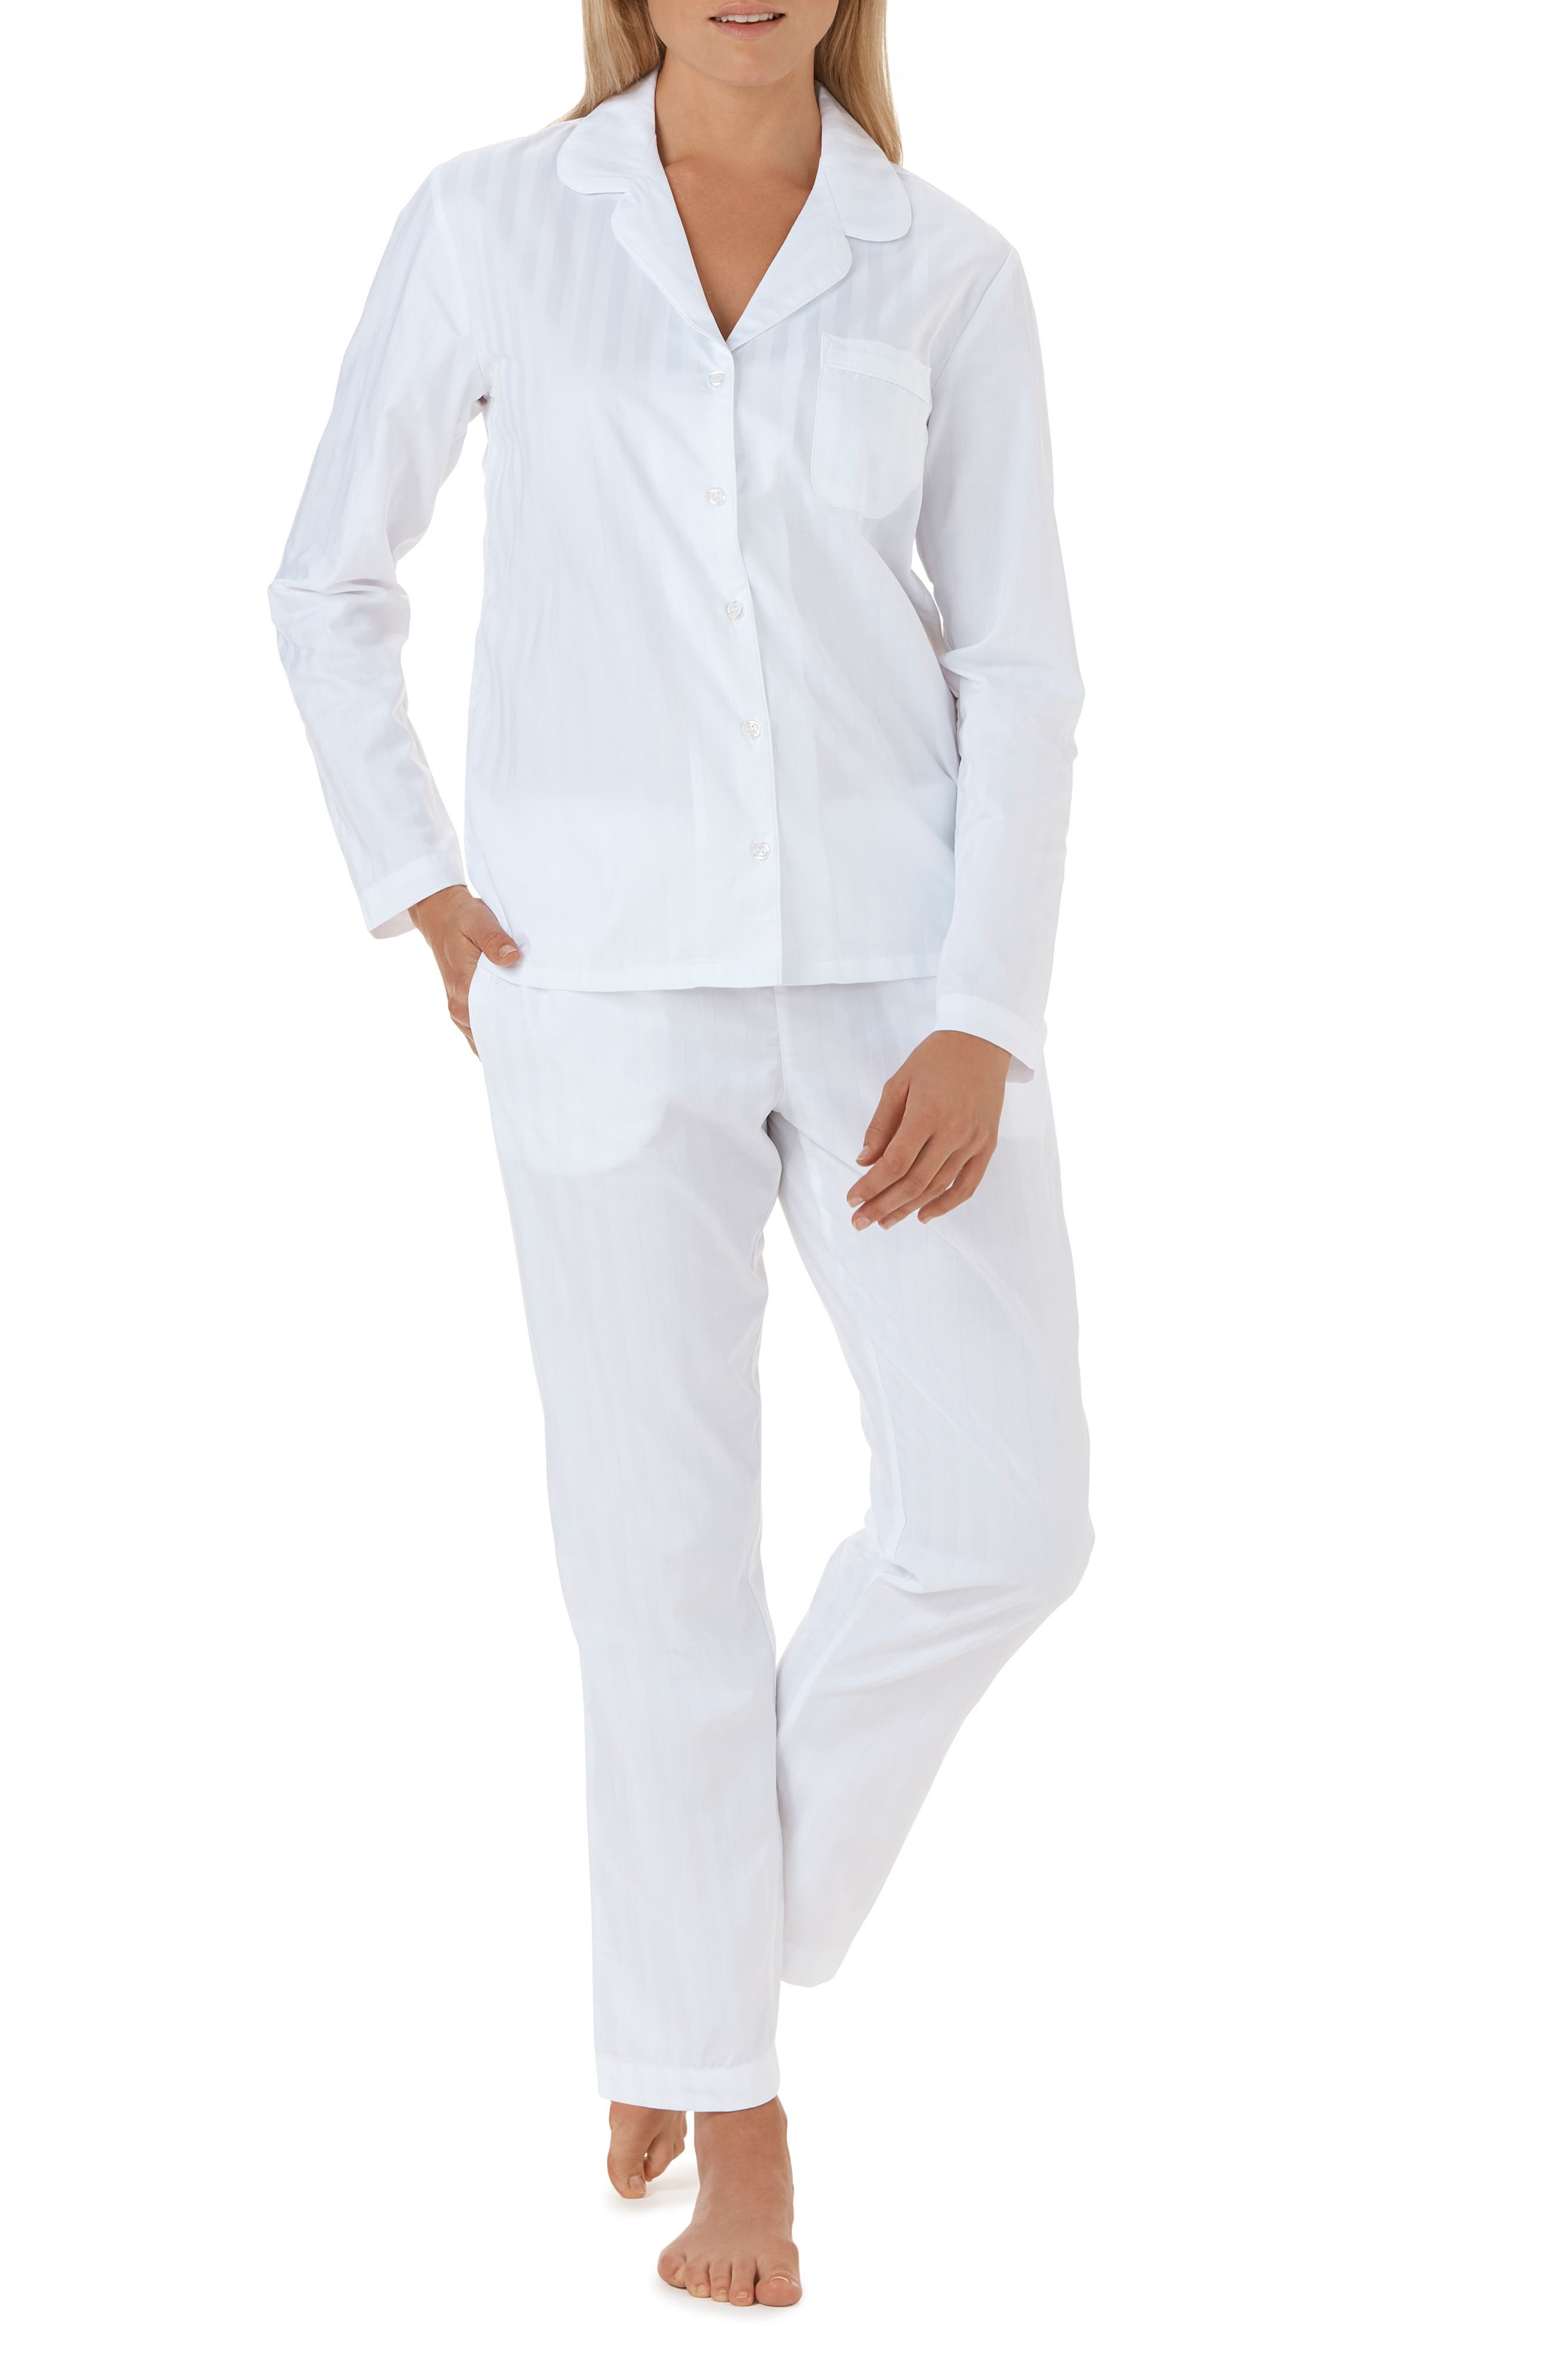 THE WHITE COMPANY,                             Cotton Pajamas,                             Main thumbnail 1, color,                             WHITE